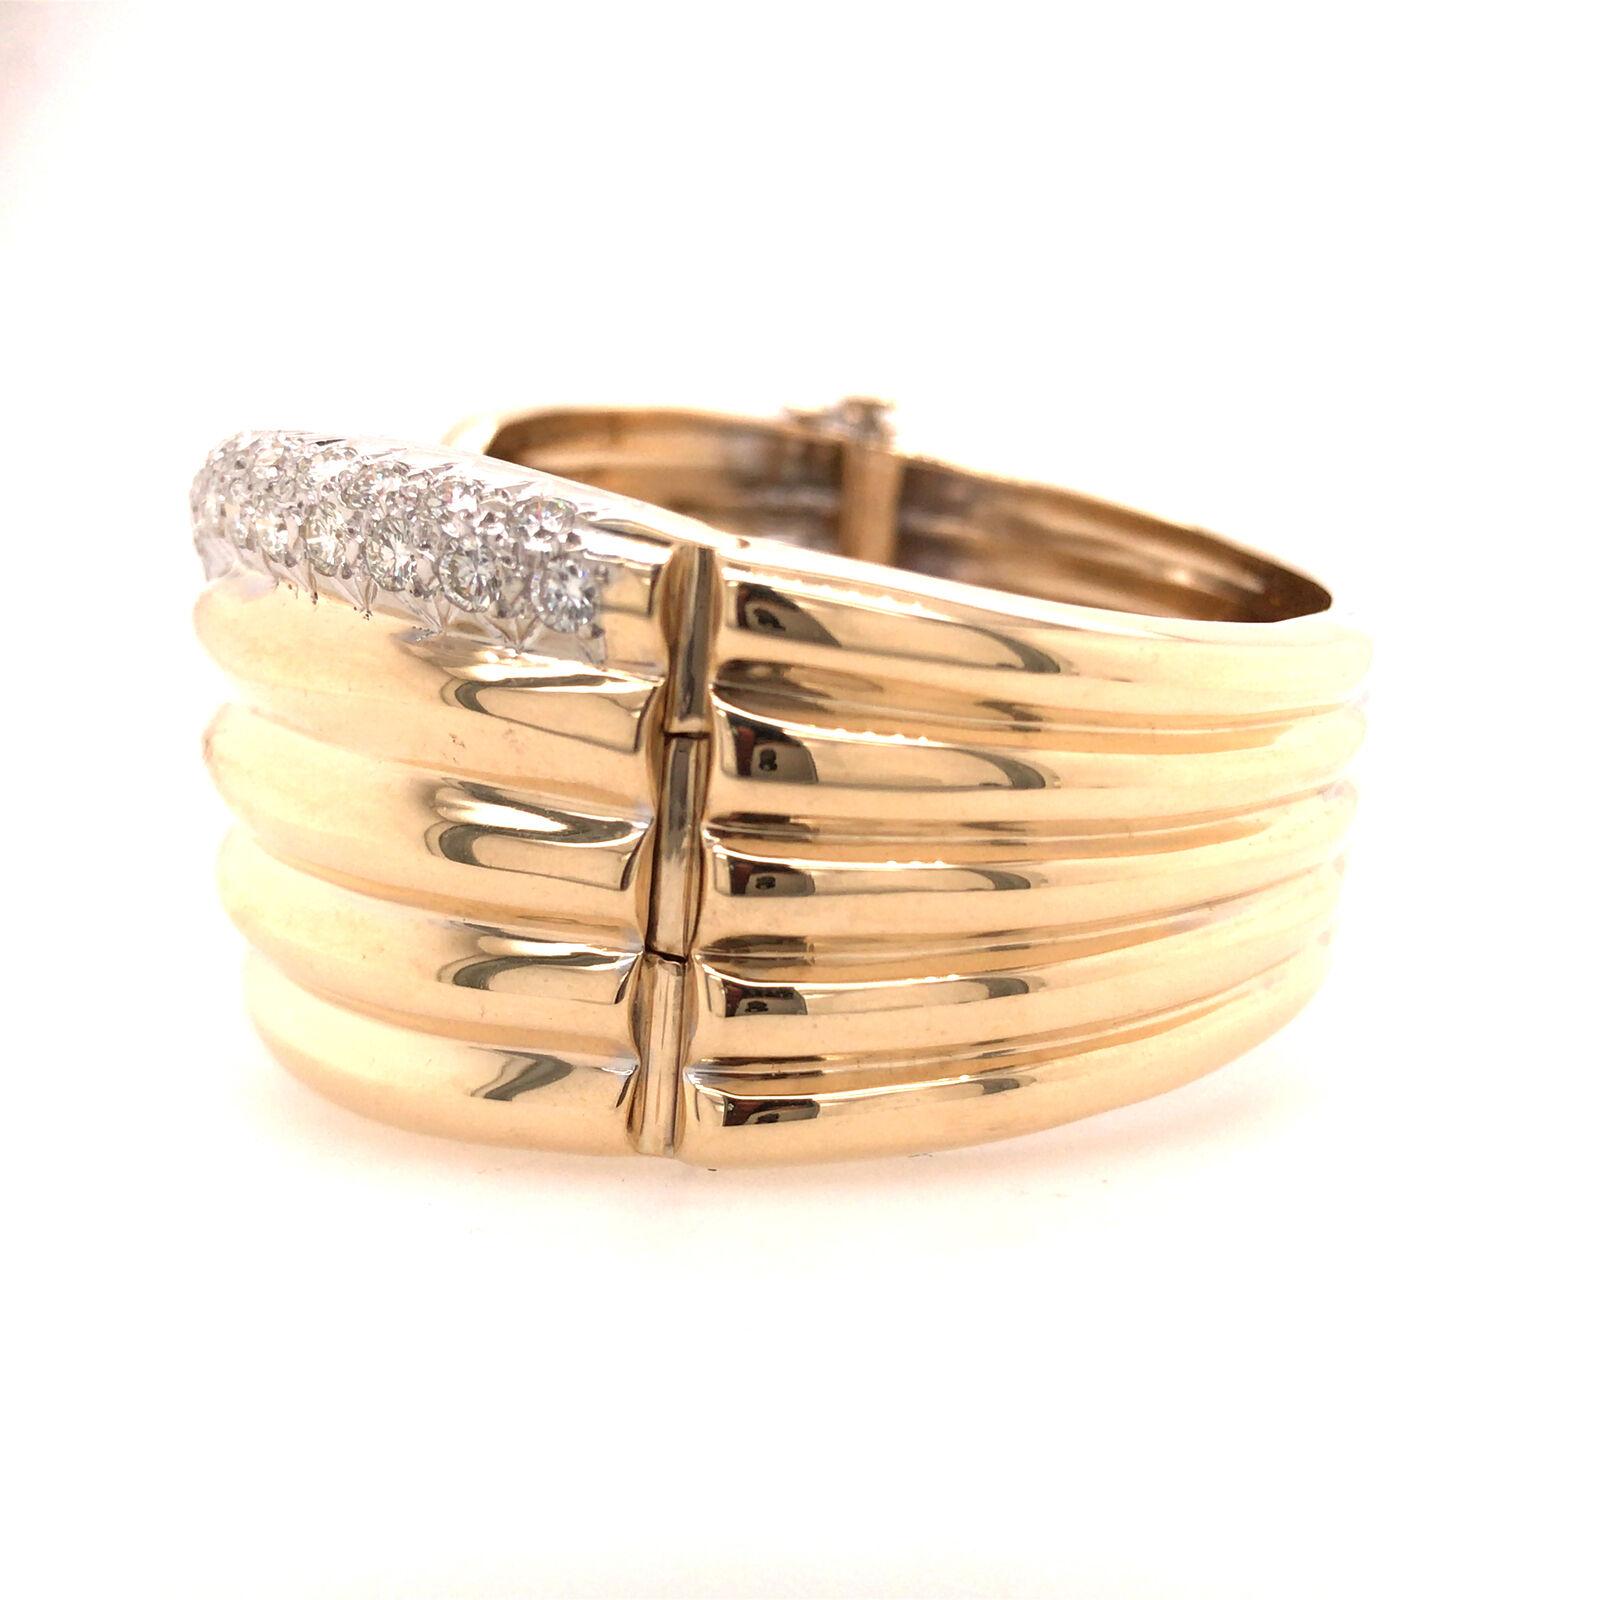 14K Wide Diamond Twist Cuff Two-Tone Gold - image 3